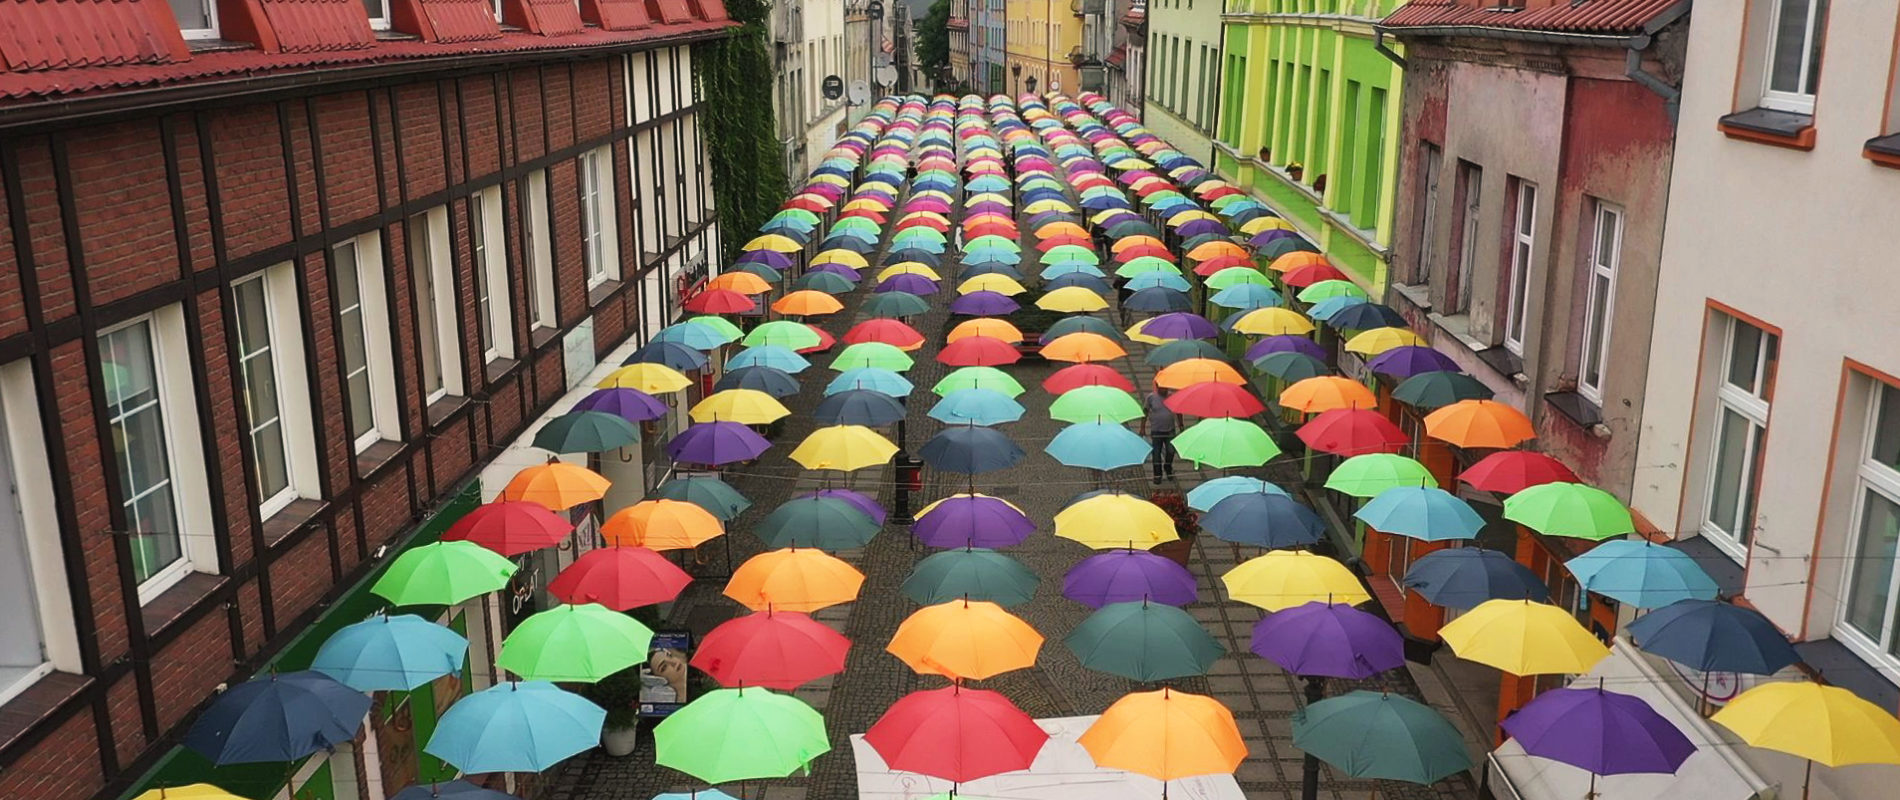 Połczyńskie parasolki